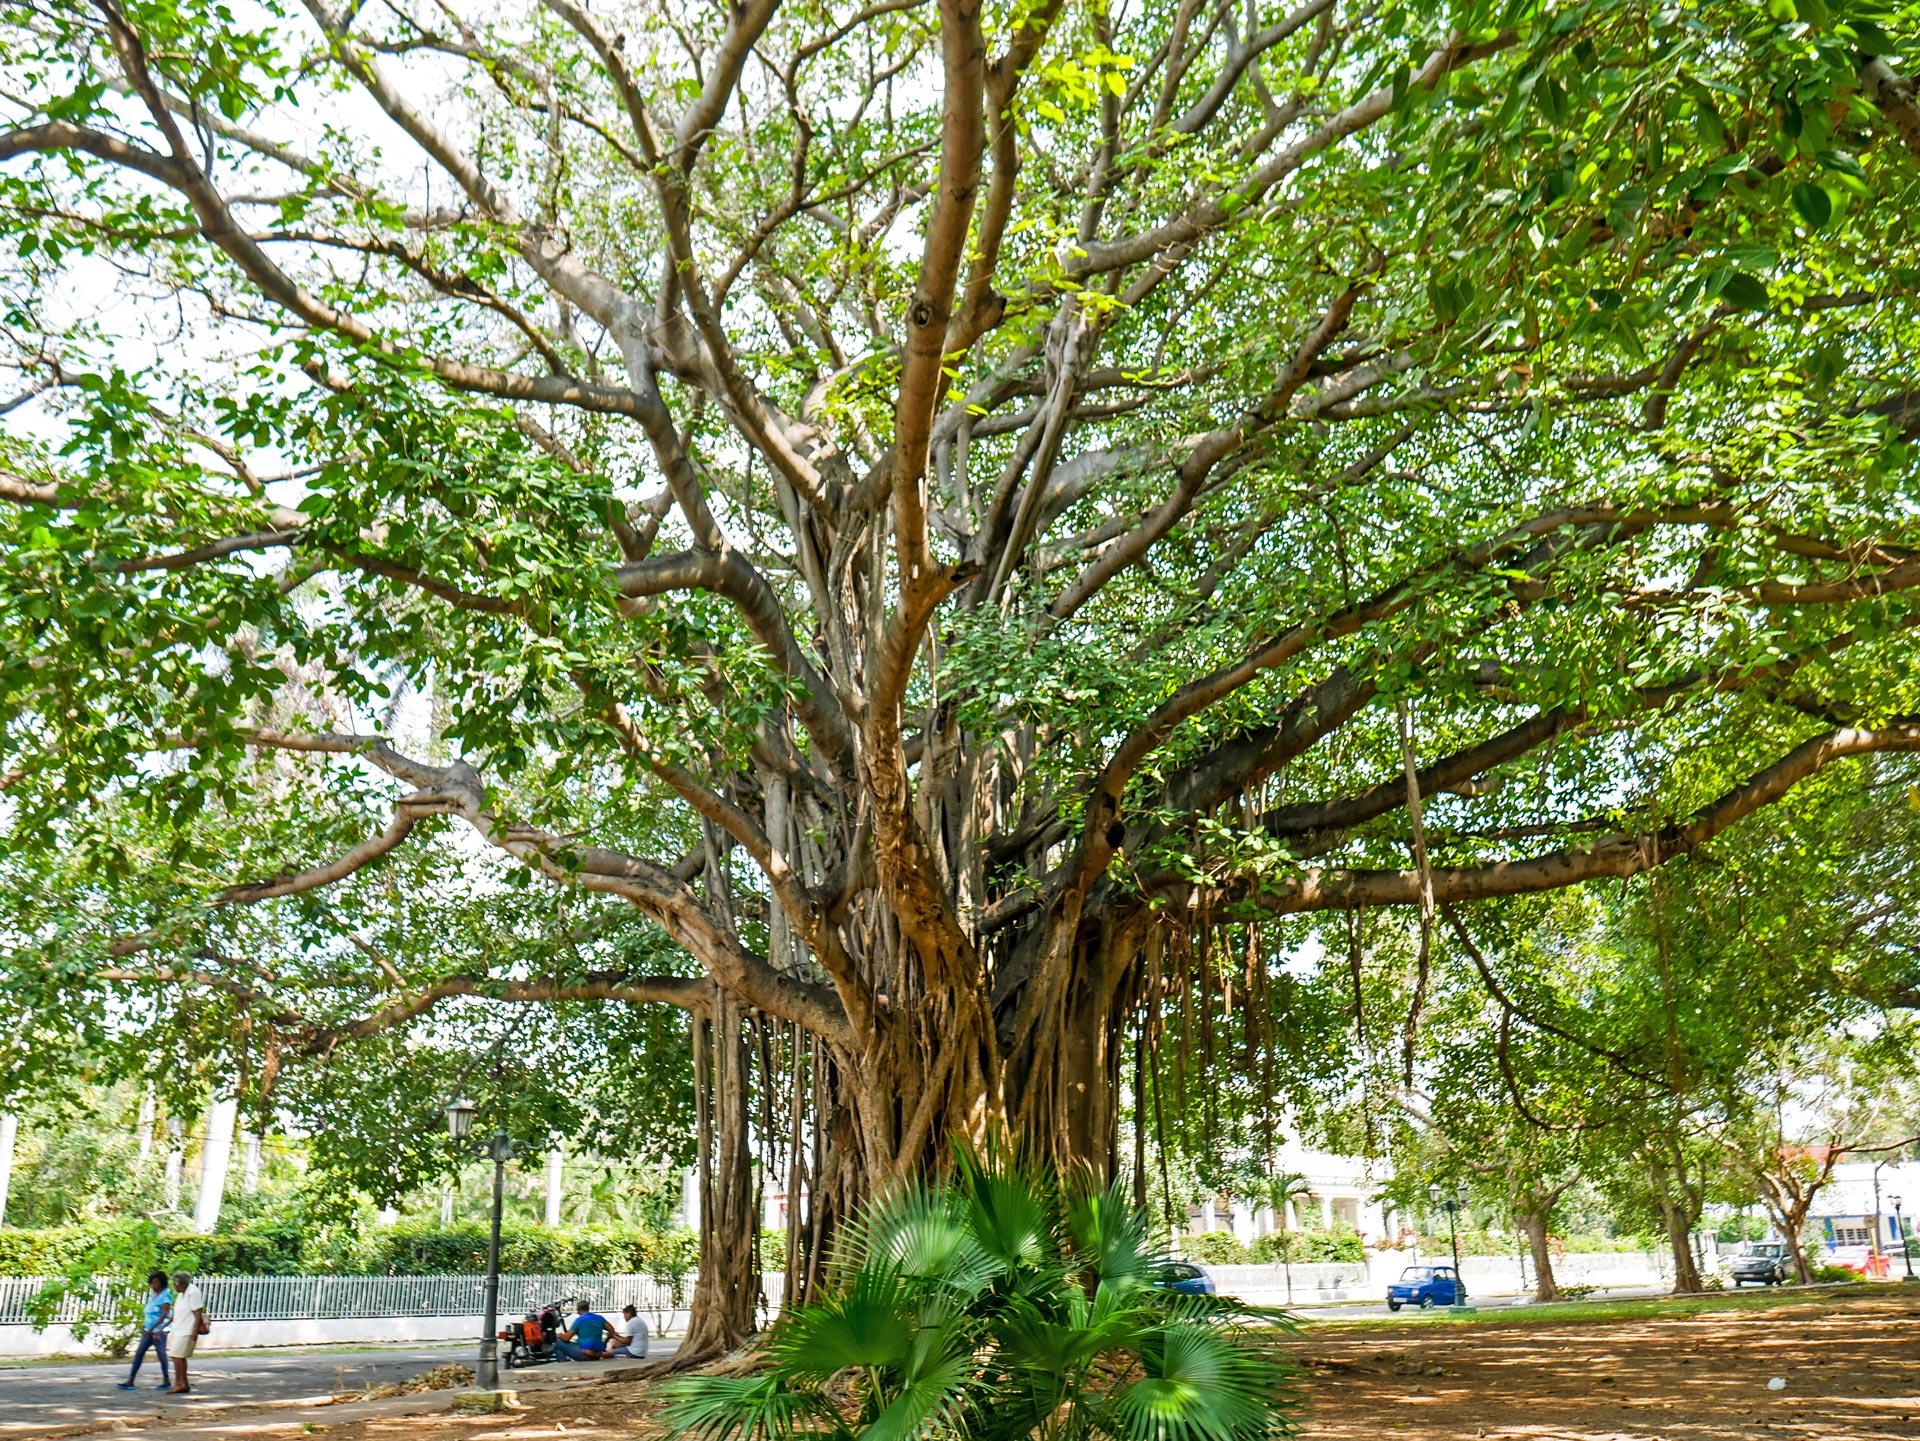 Banyan tree in Parque Miramar in Havana, Cuba